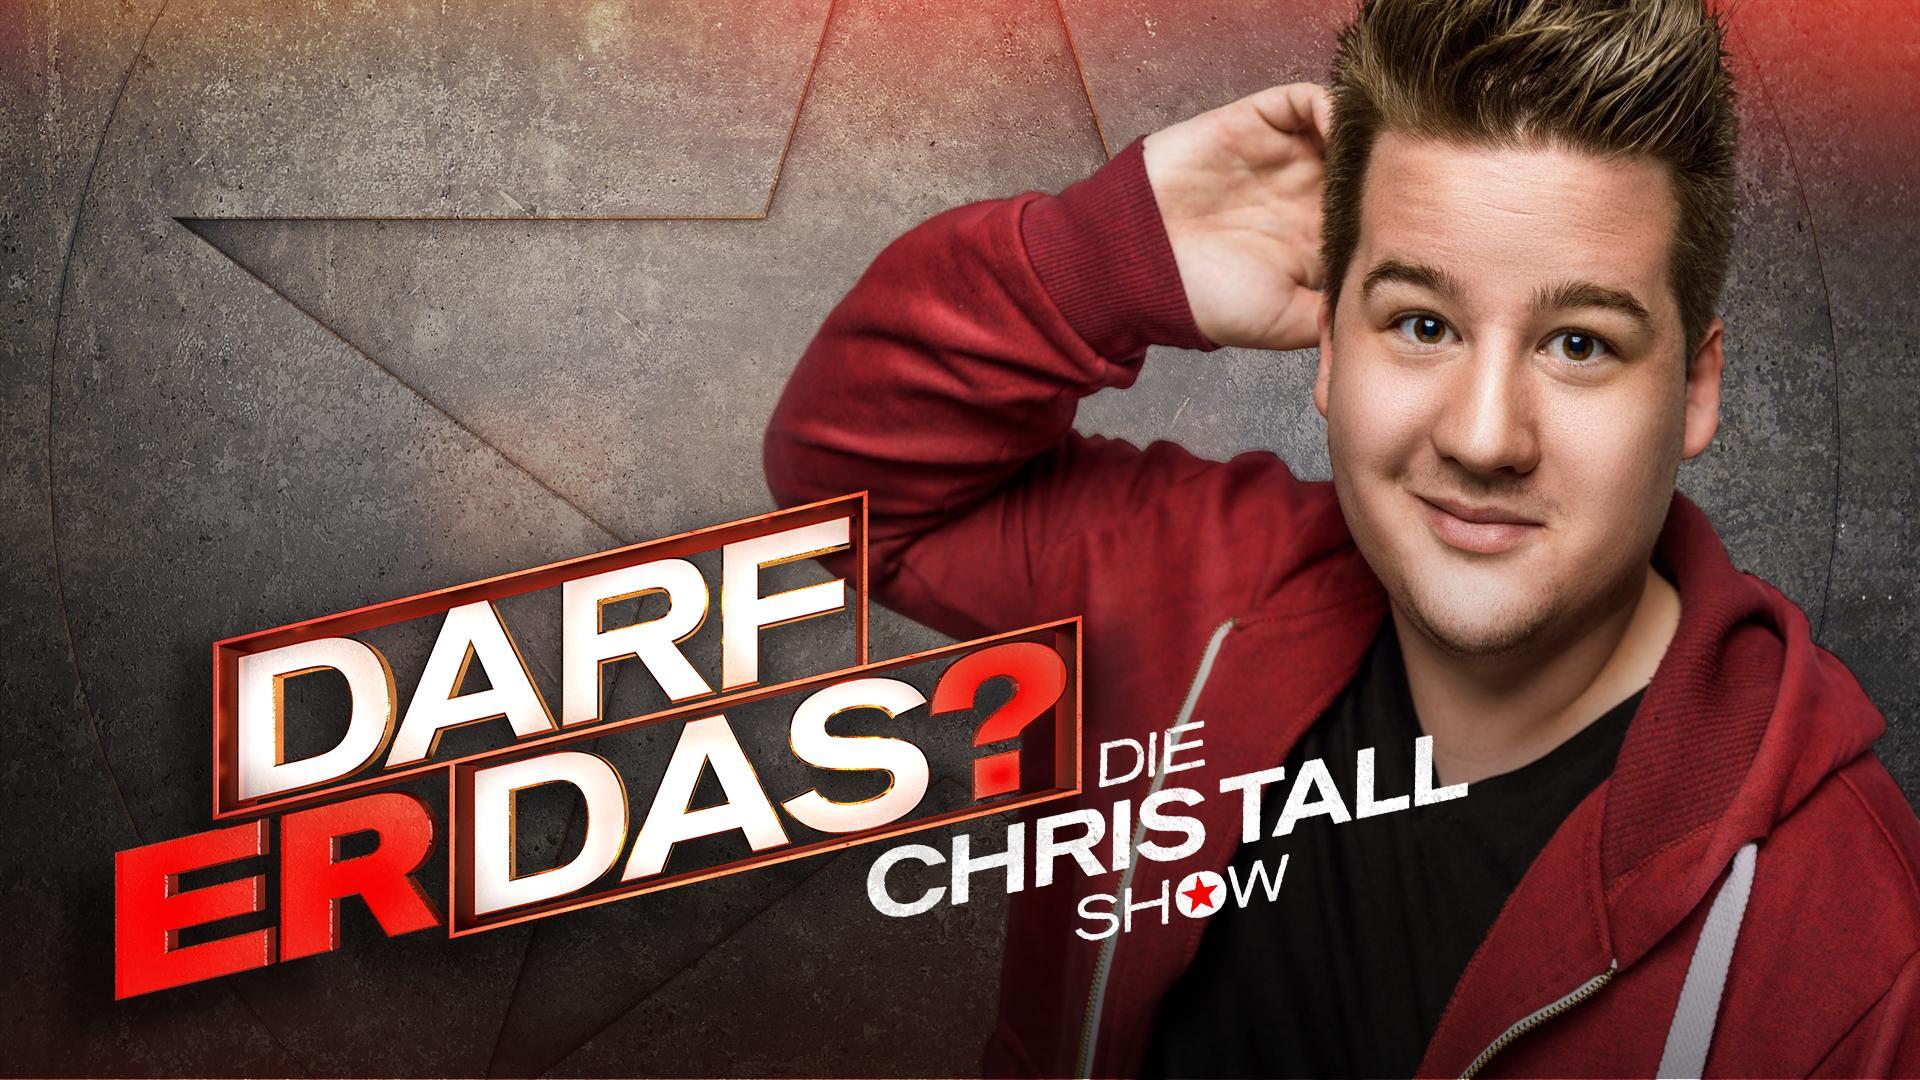 Chris Tall Show